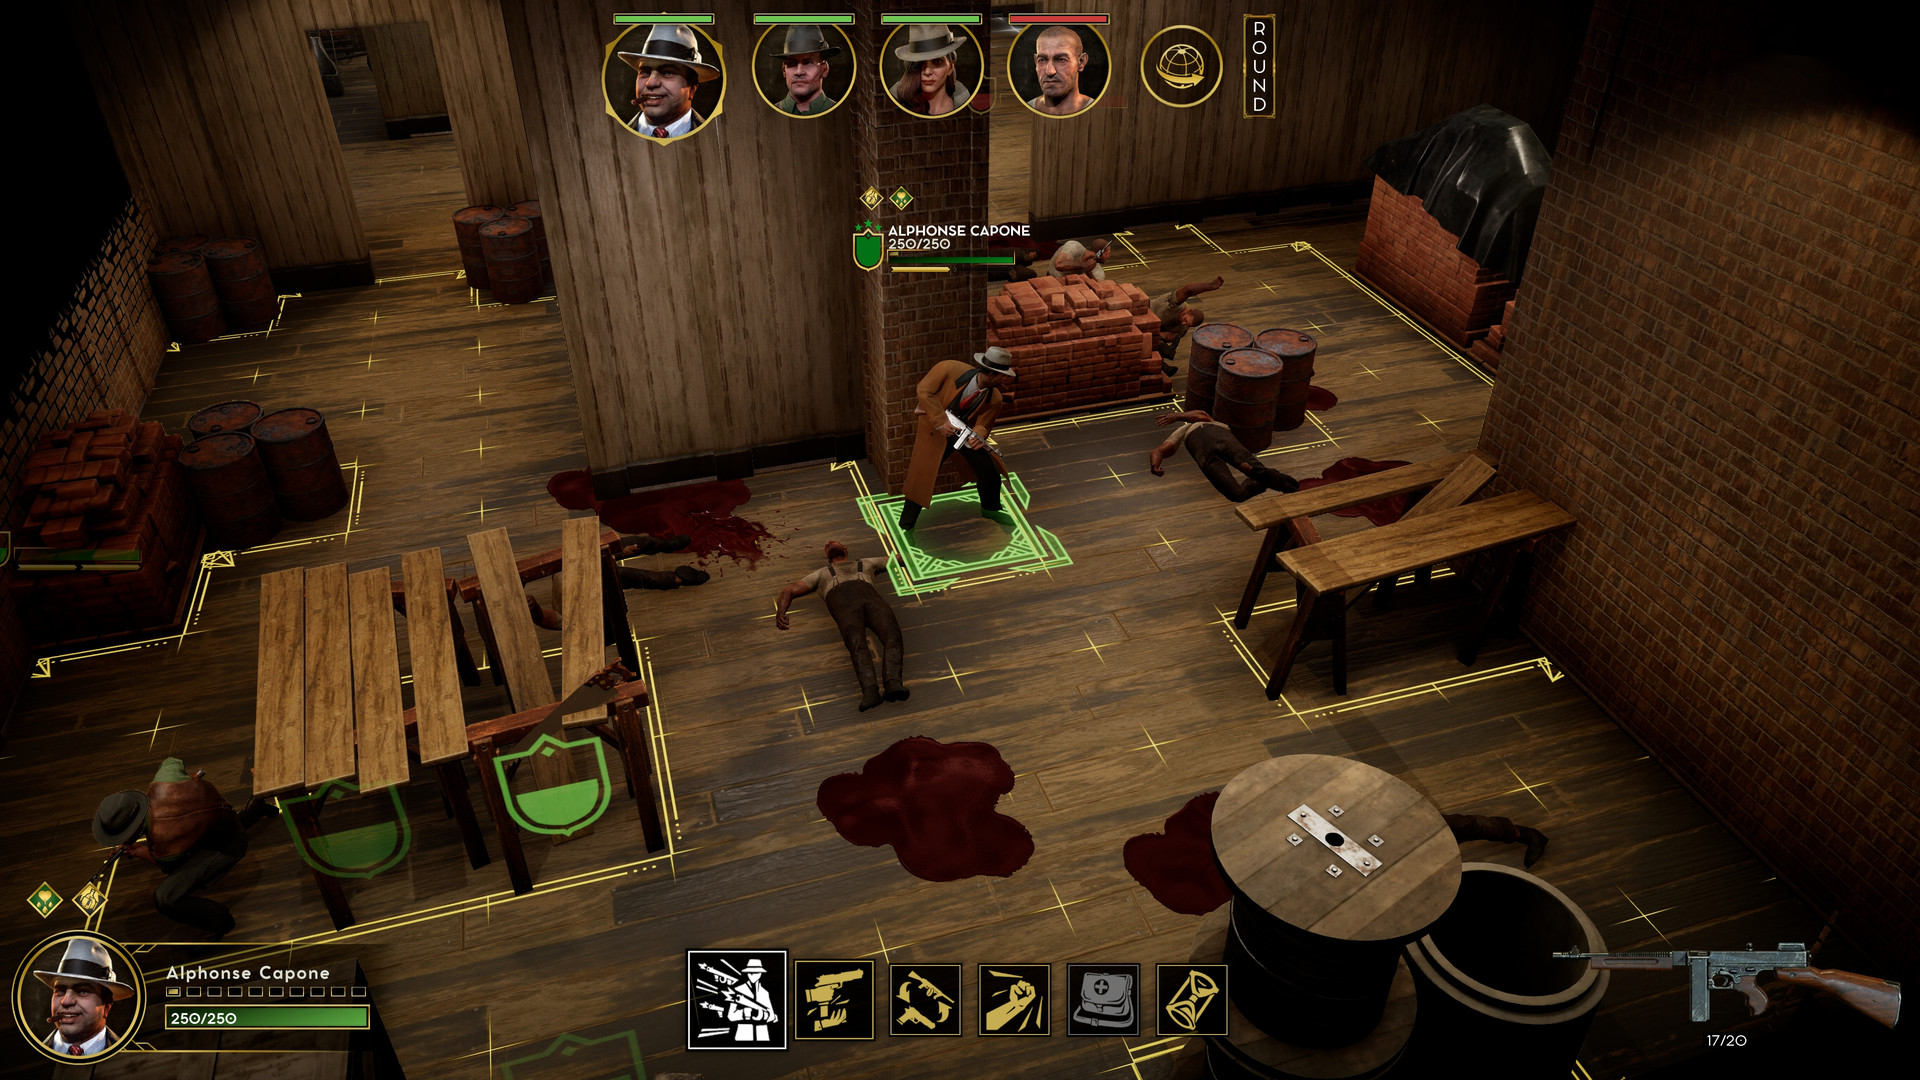 Capone casino ii mobile game download the game metal slug 2